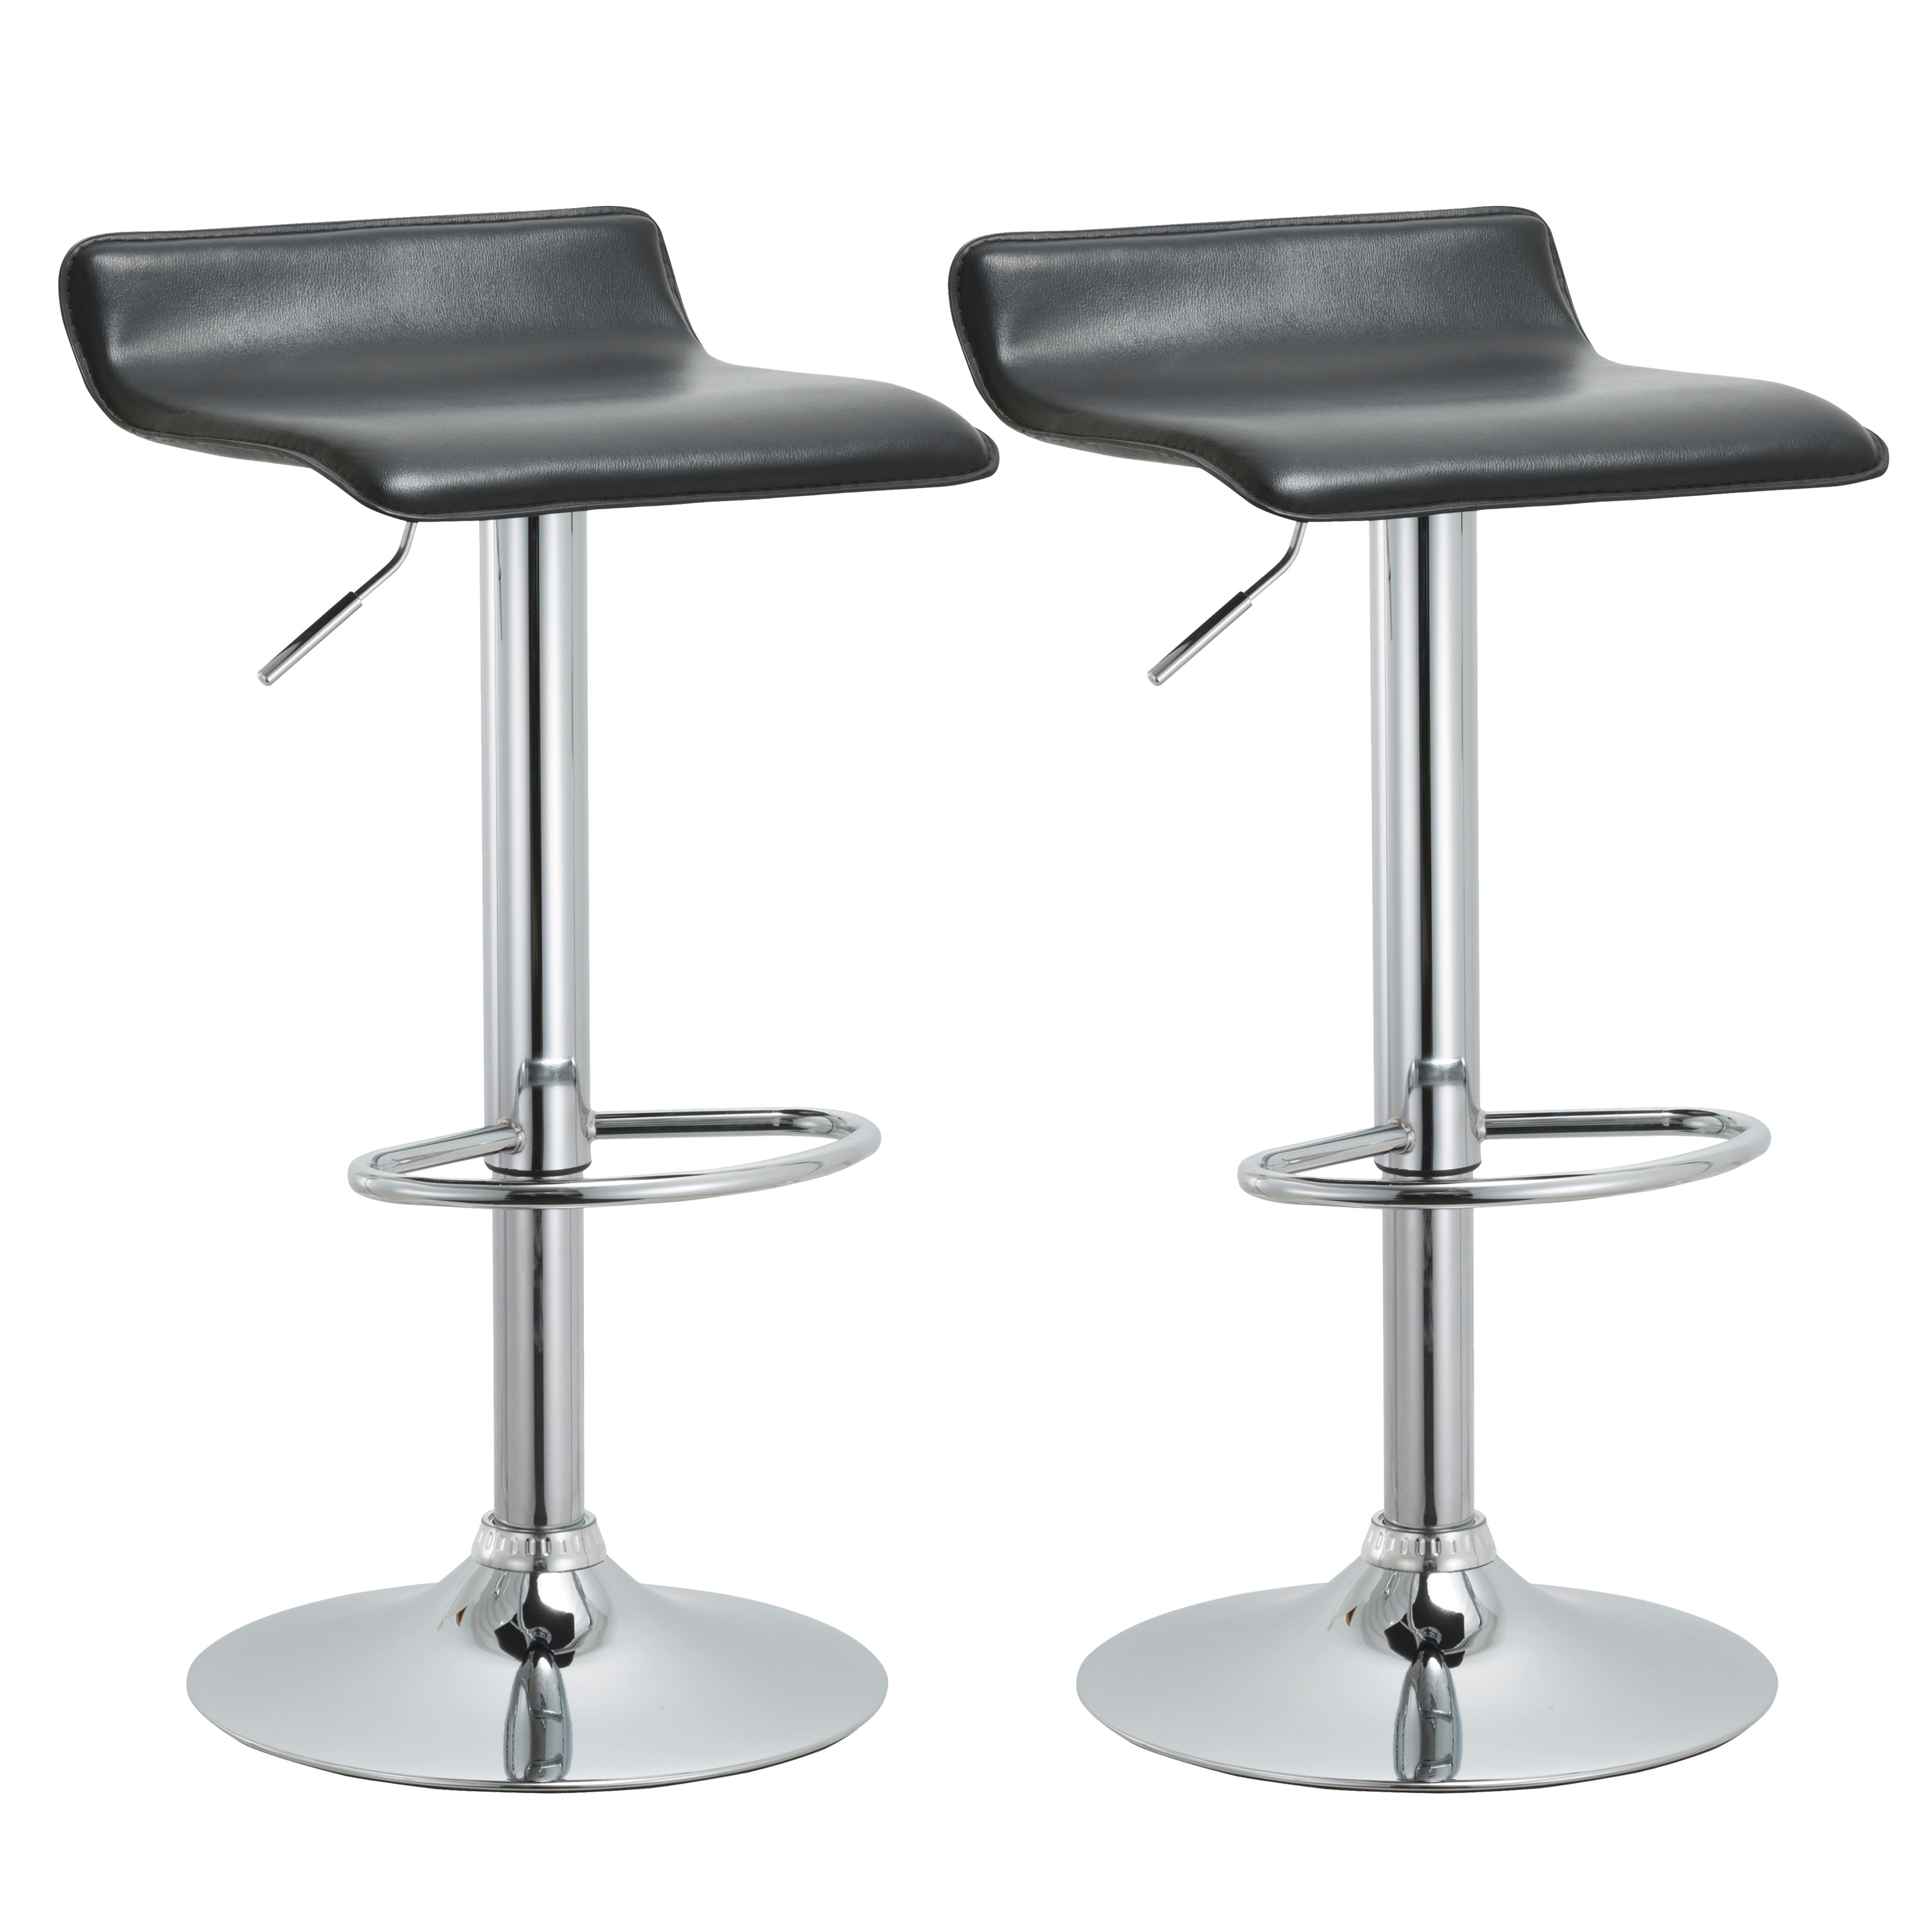 Fashion Rotary Lifting Bar Chair 3 Color Optional Furniture Bar Furniture